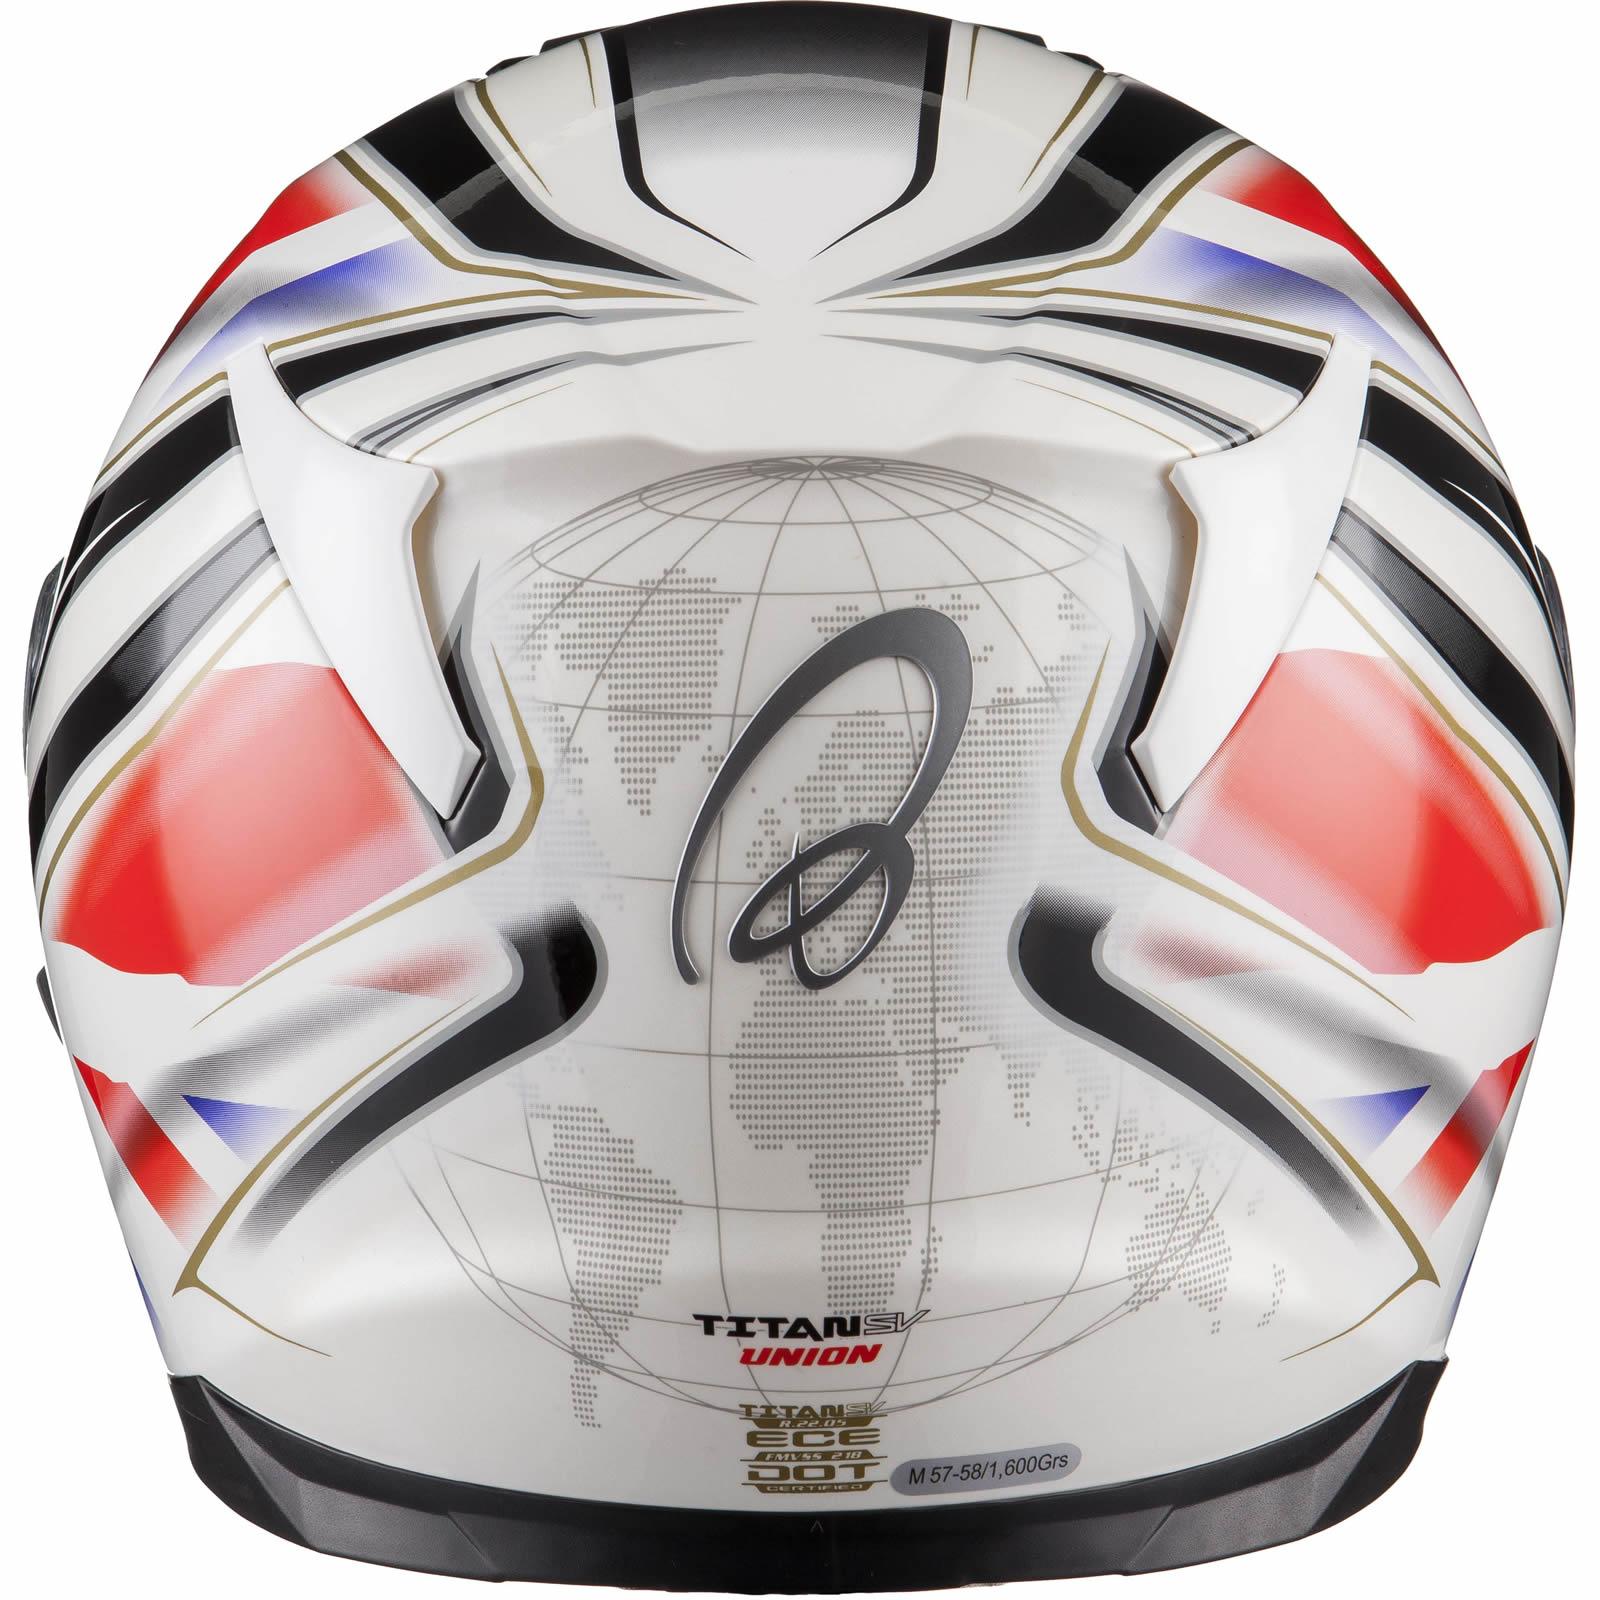 Titan Sv Union Motorcycle Helmet